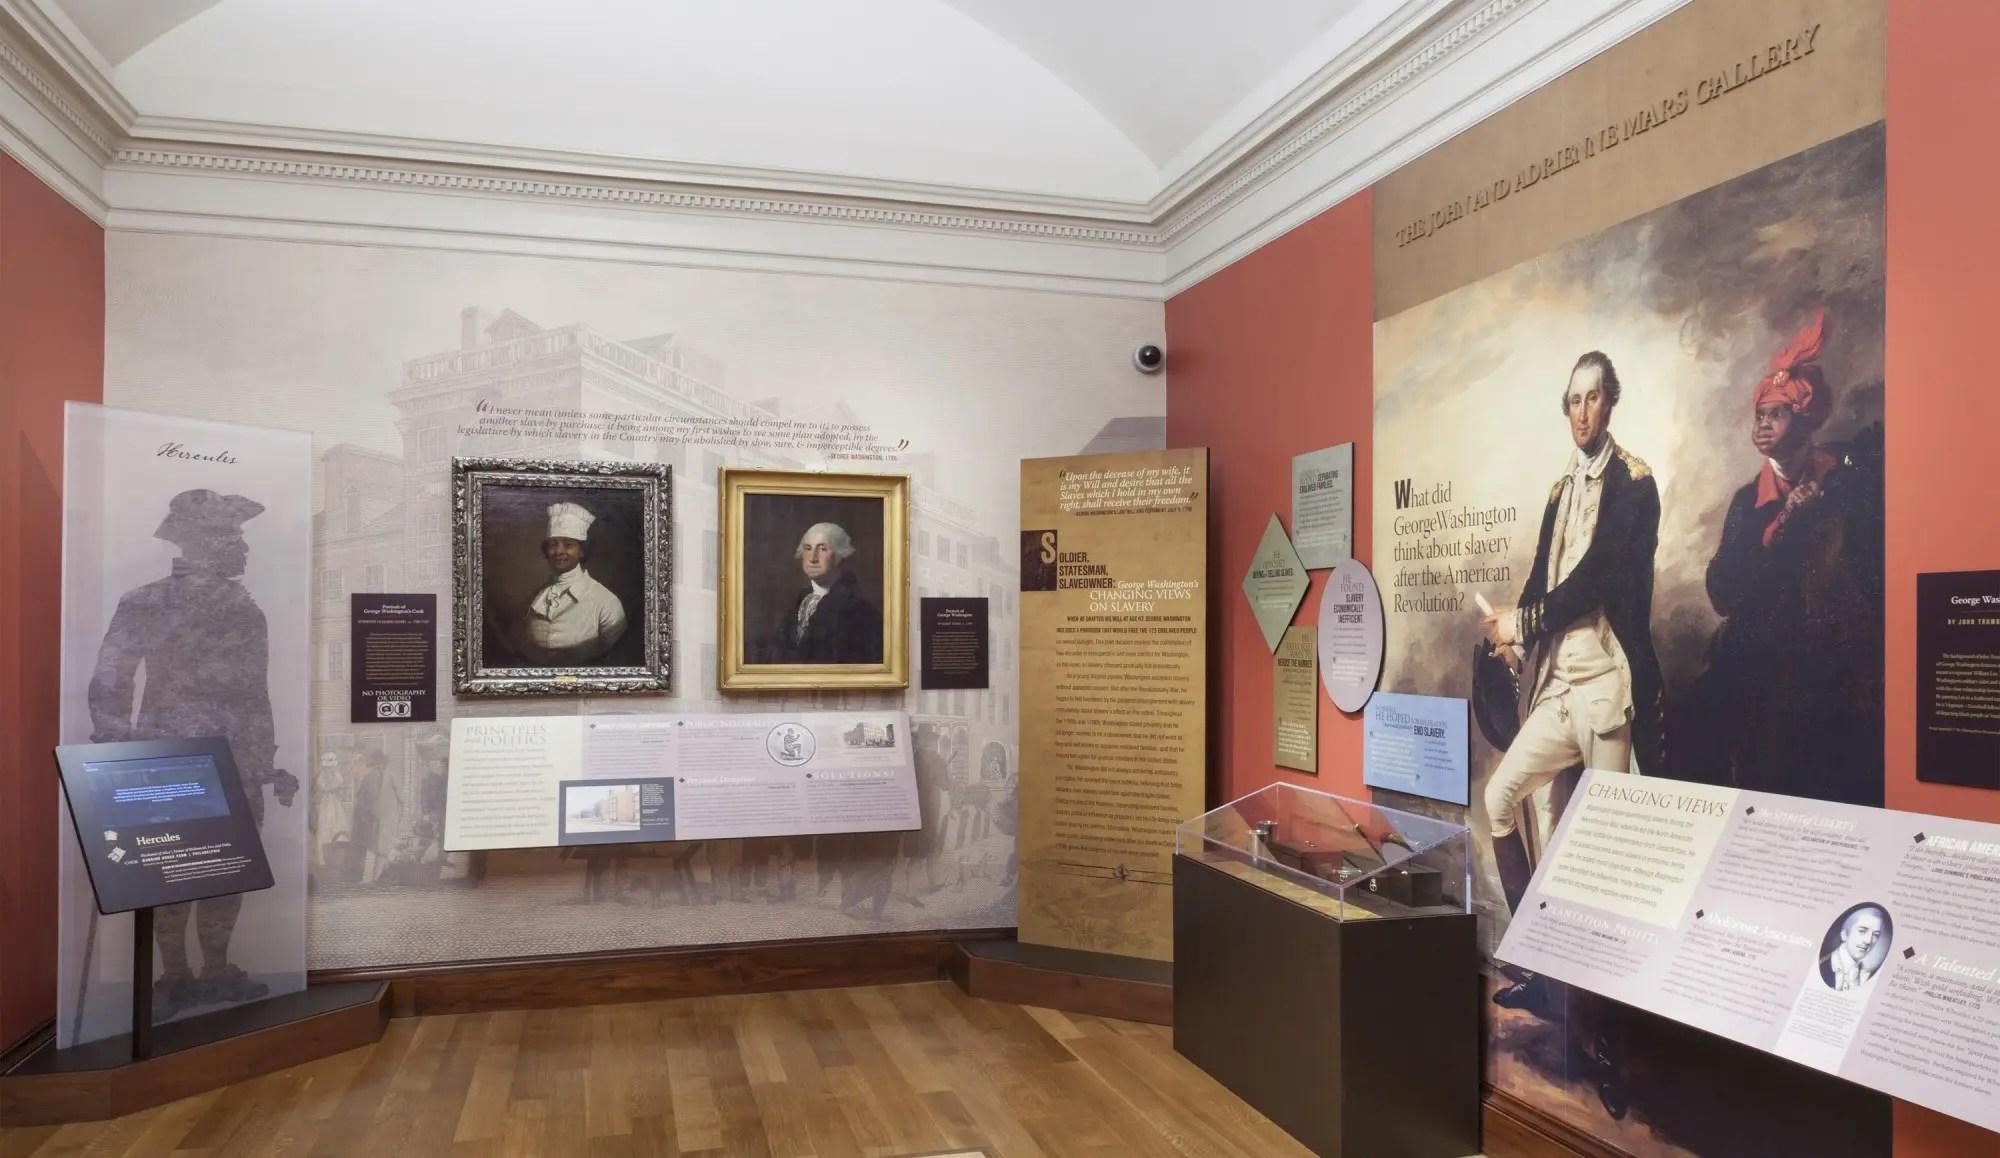 Timeline Of Interpretation Of Slavery At Mount Vernon